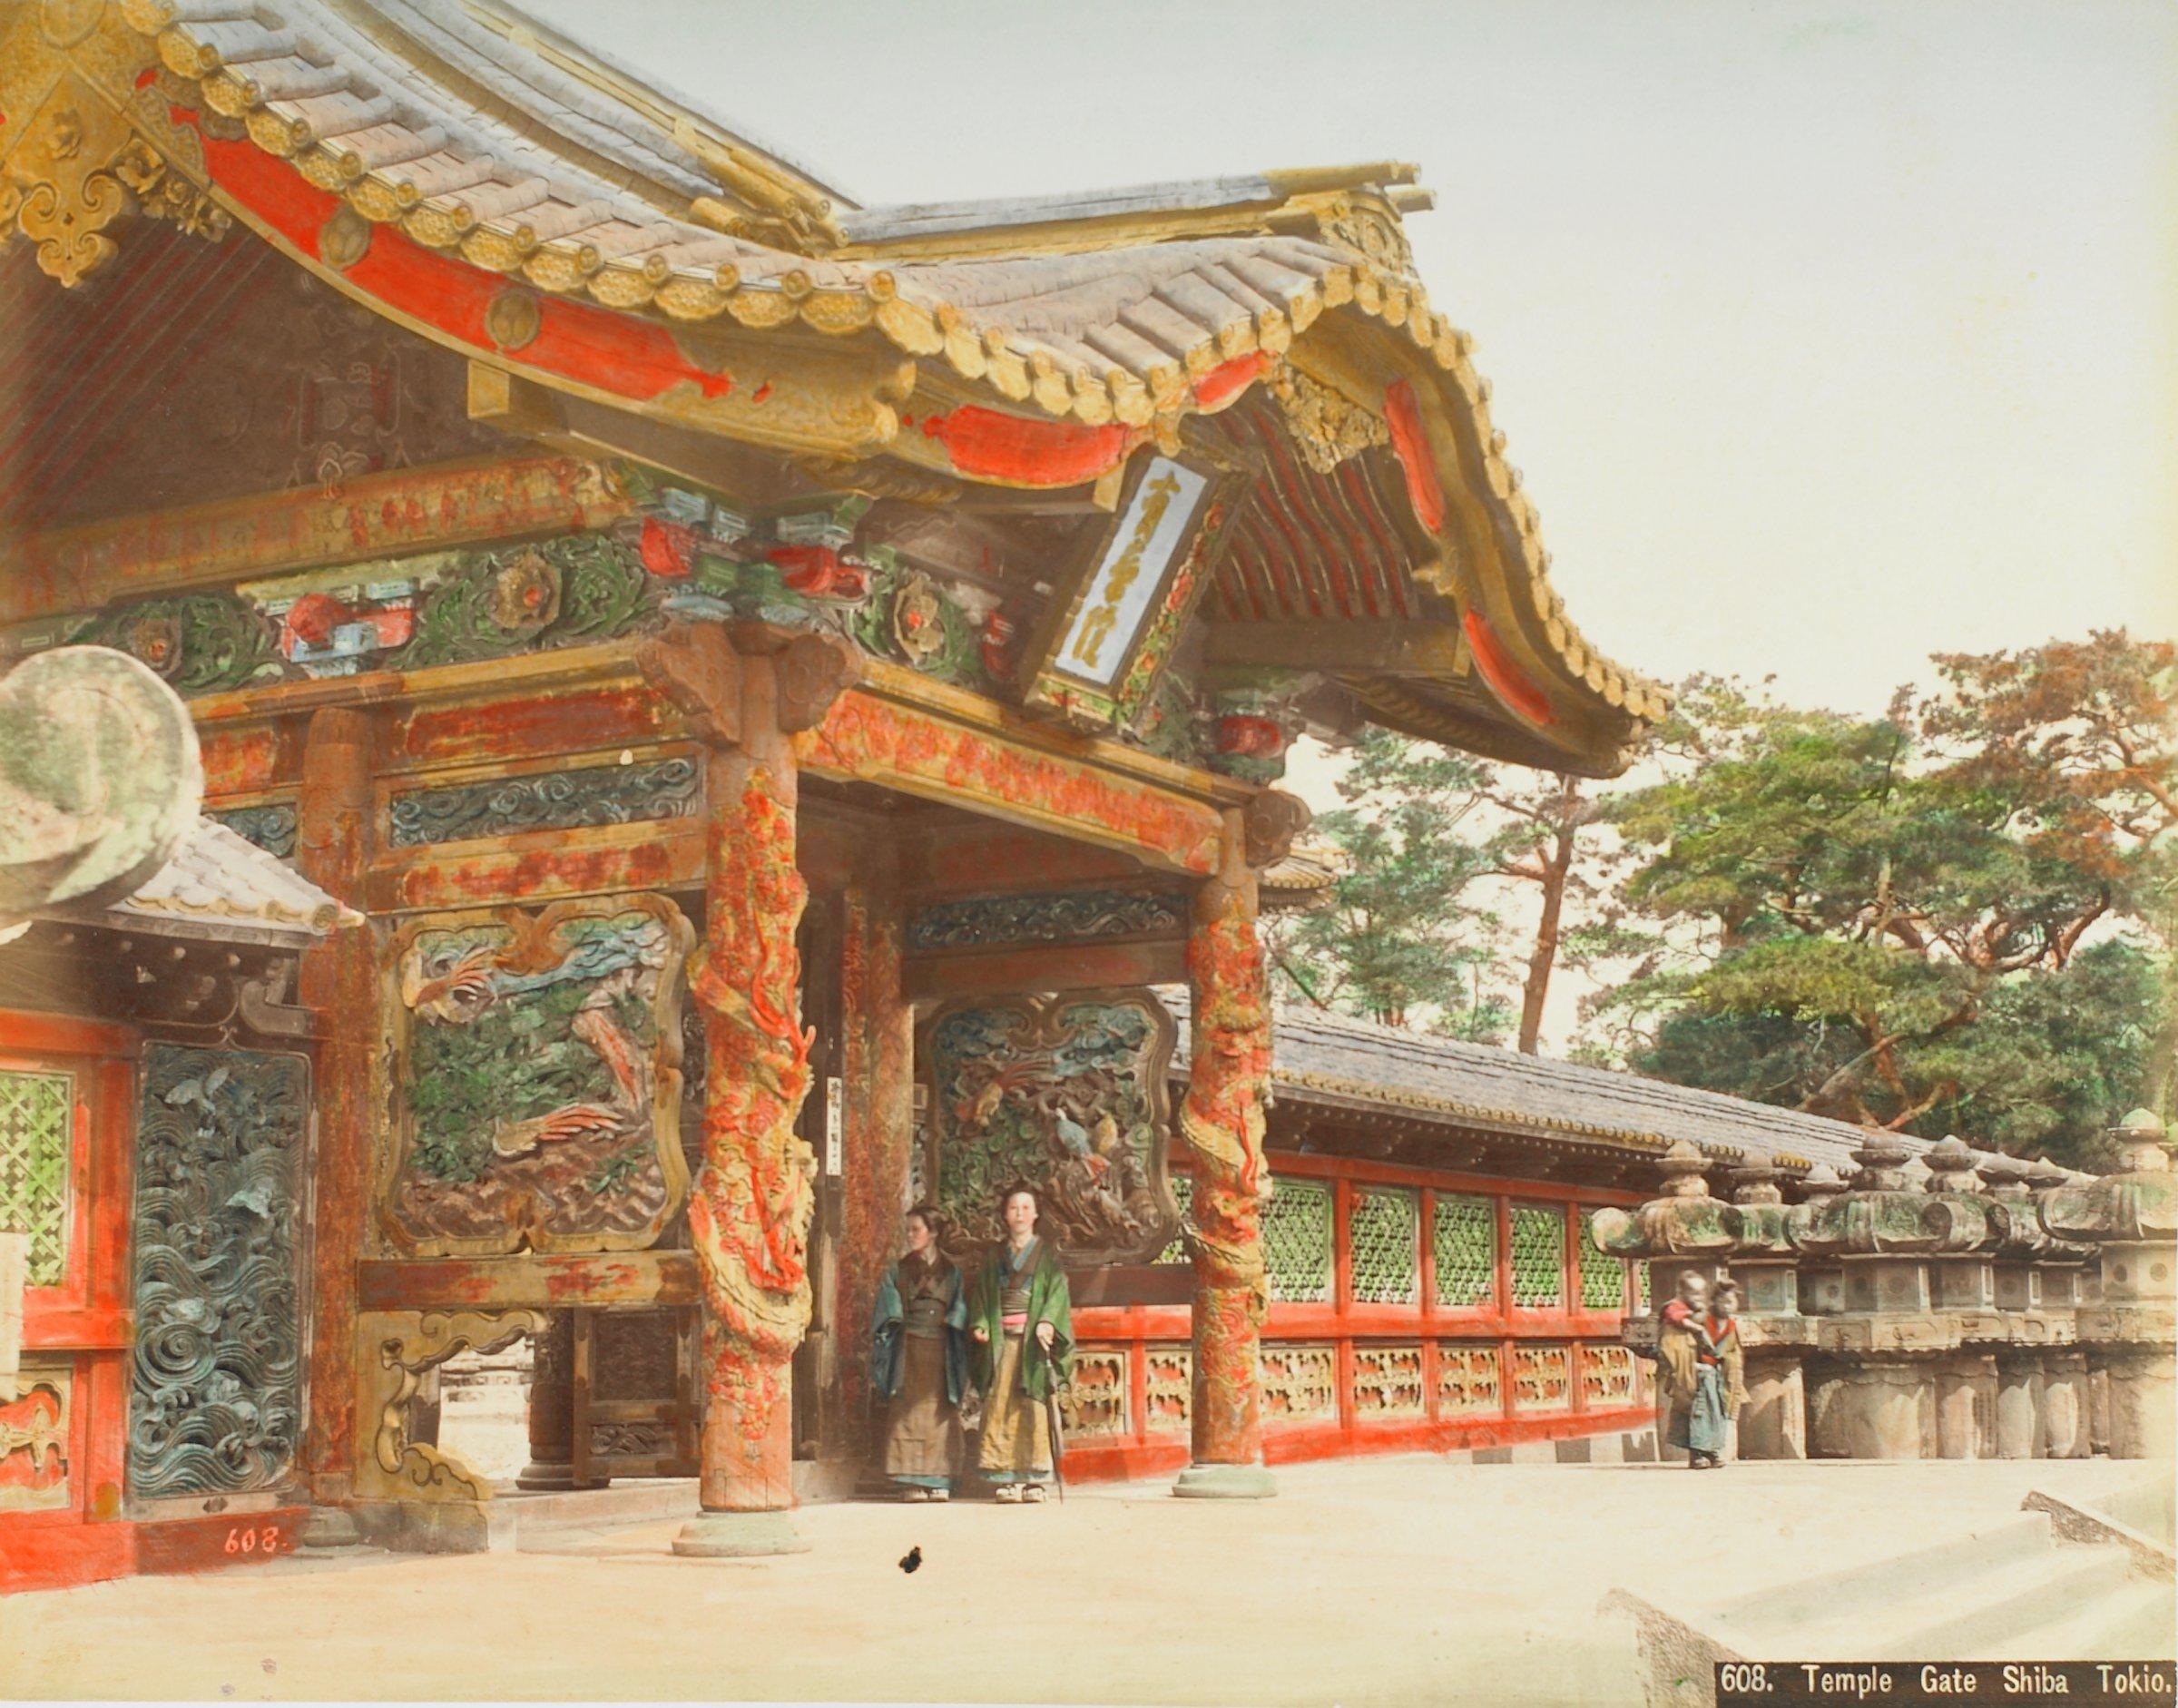 Temple Gate Shiba Tokio (.36, recto); Prince Hotta's Garden at Tokio (.37, verso), Attributed to Kusakabe Kimbei, hand-colored albumen prints mounted to album page